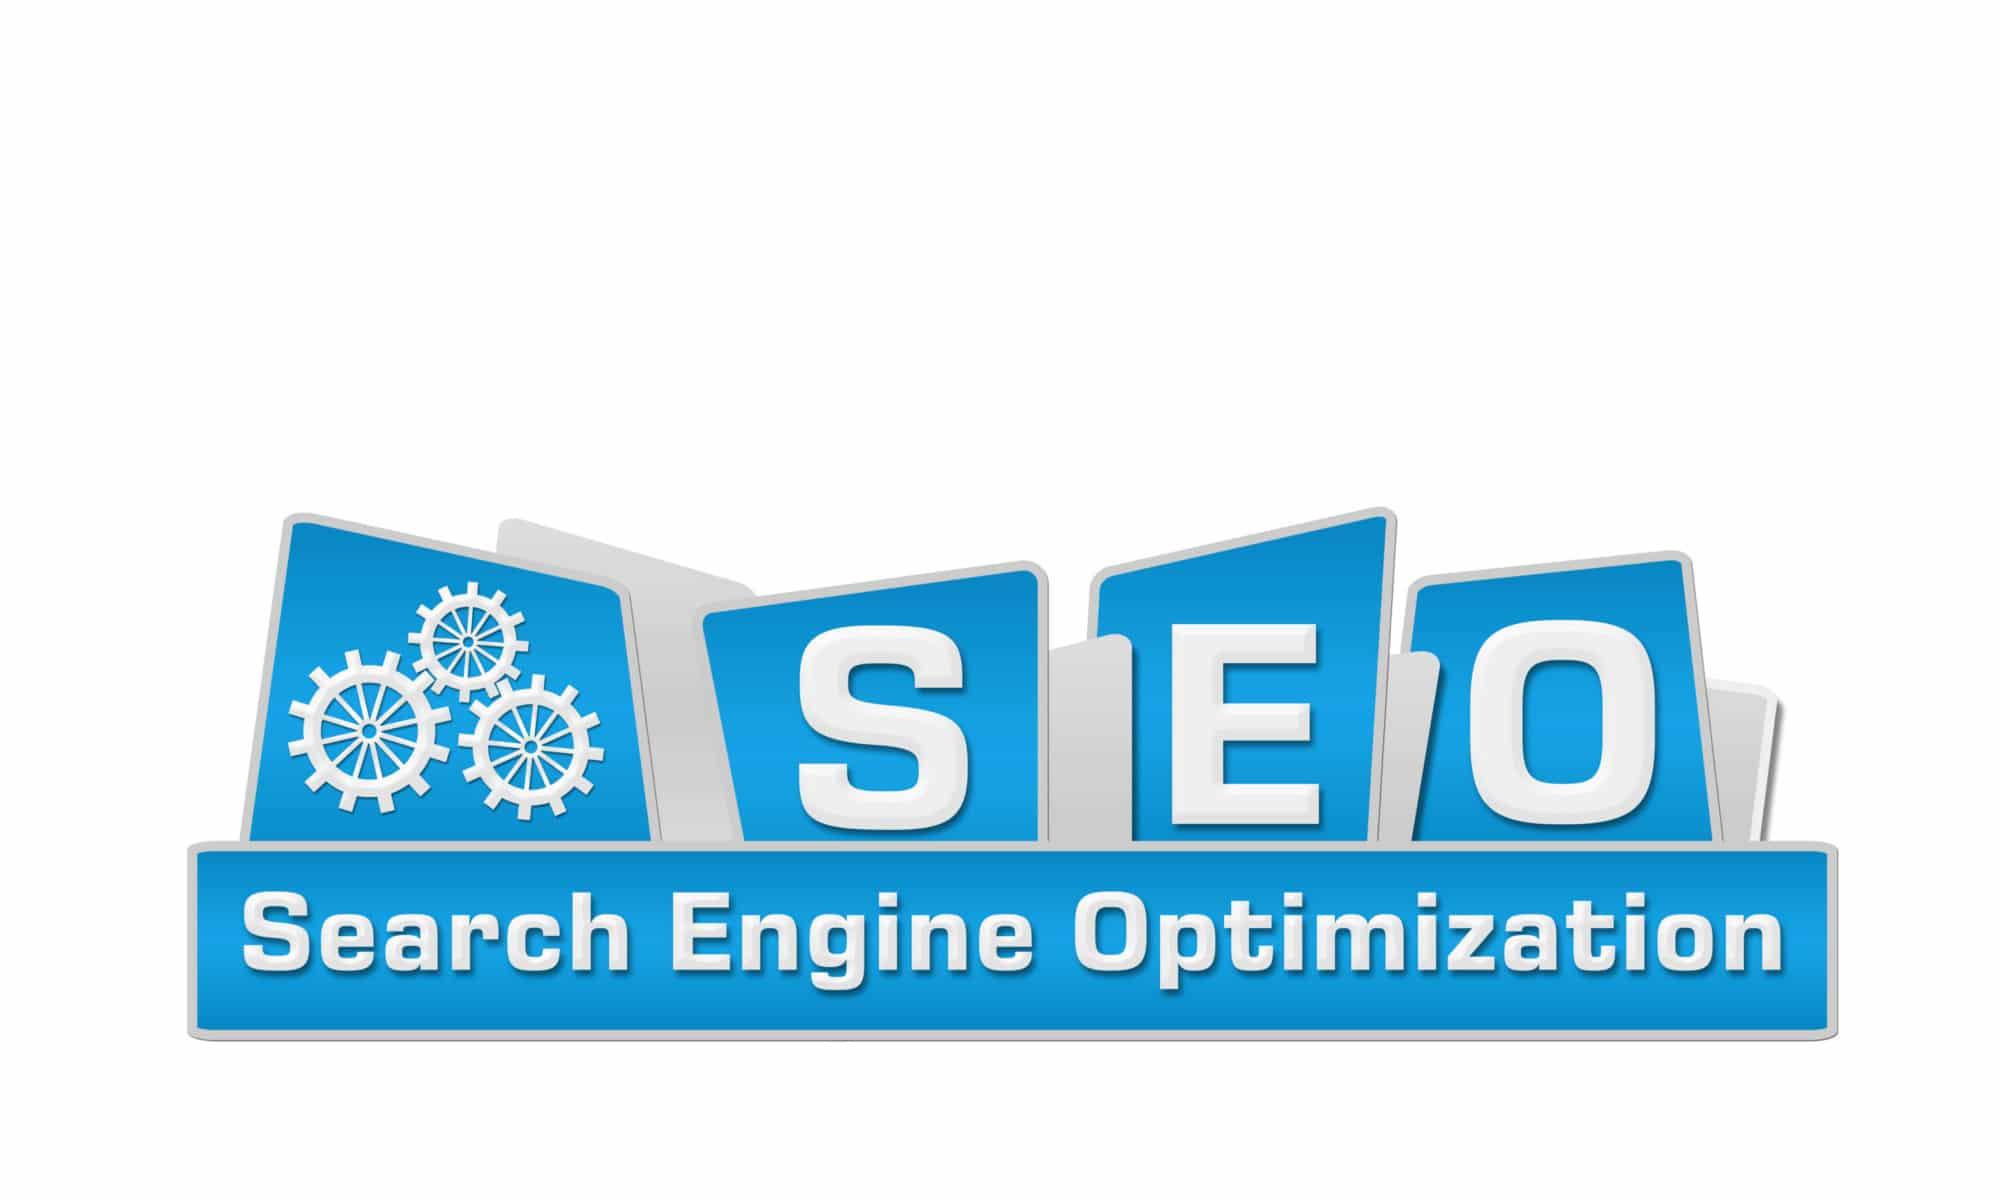 Search Engine Optimization Logan Township